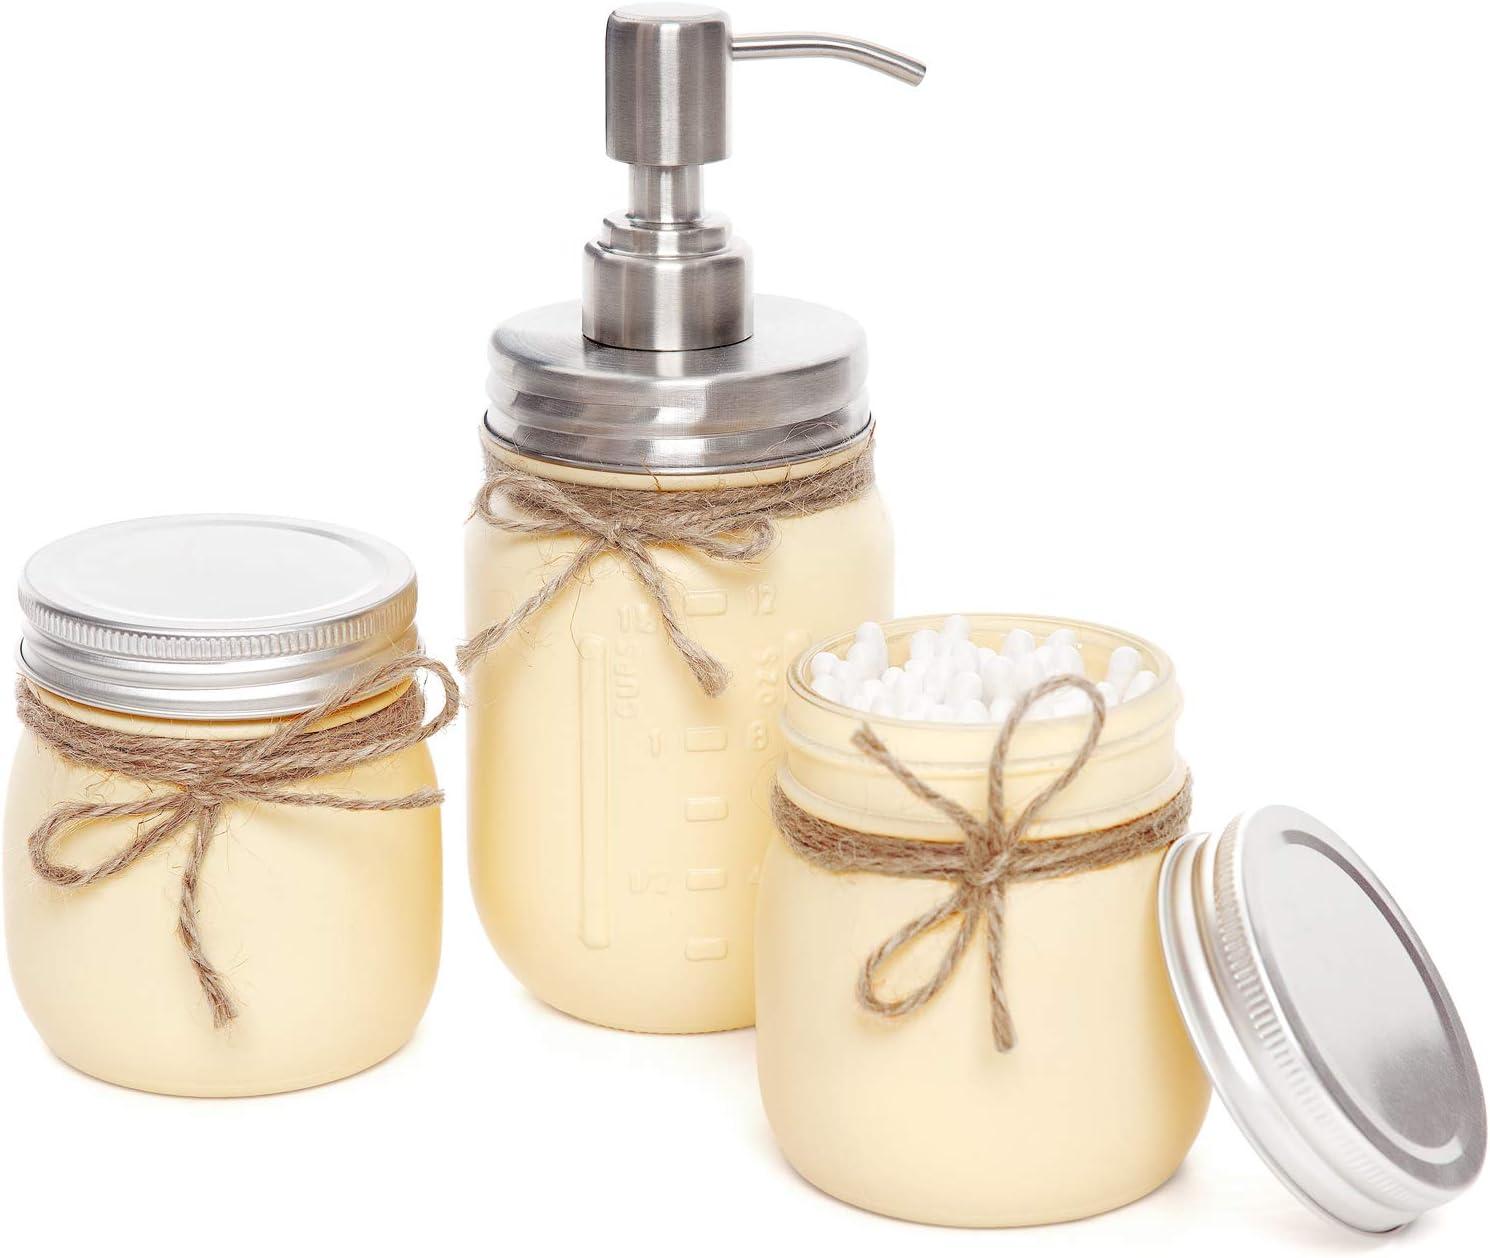 Shabby Chic Rustic Farmhouse Decor Tan Mason Jar Bathroom Vanity